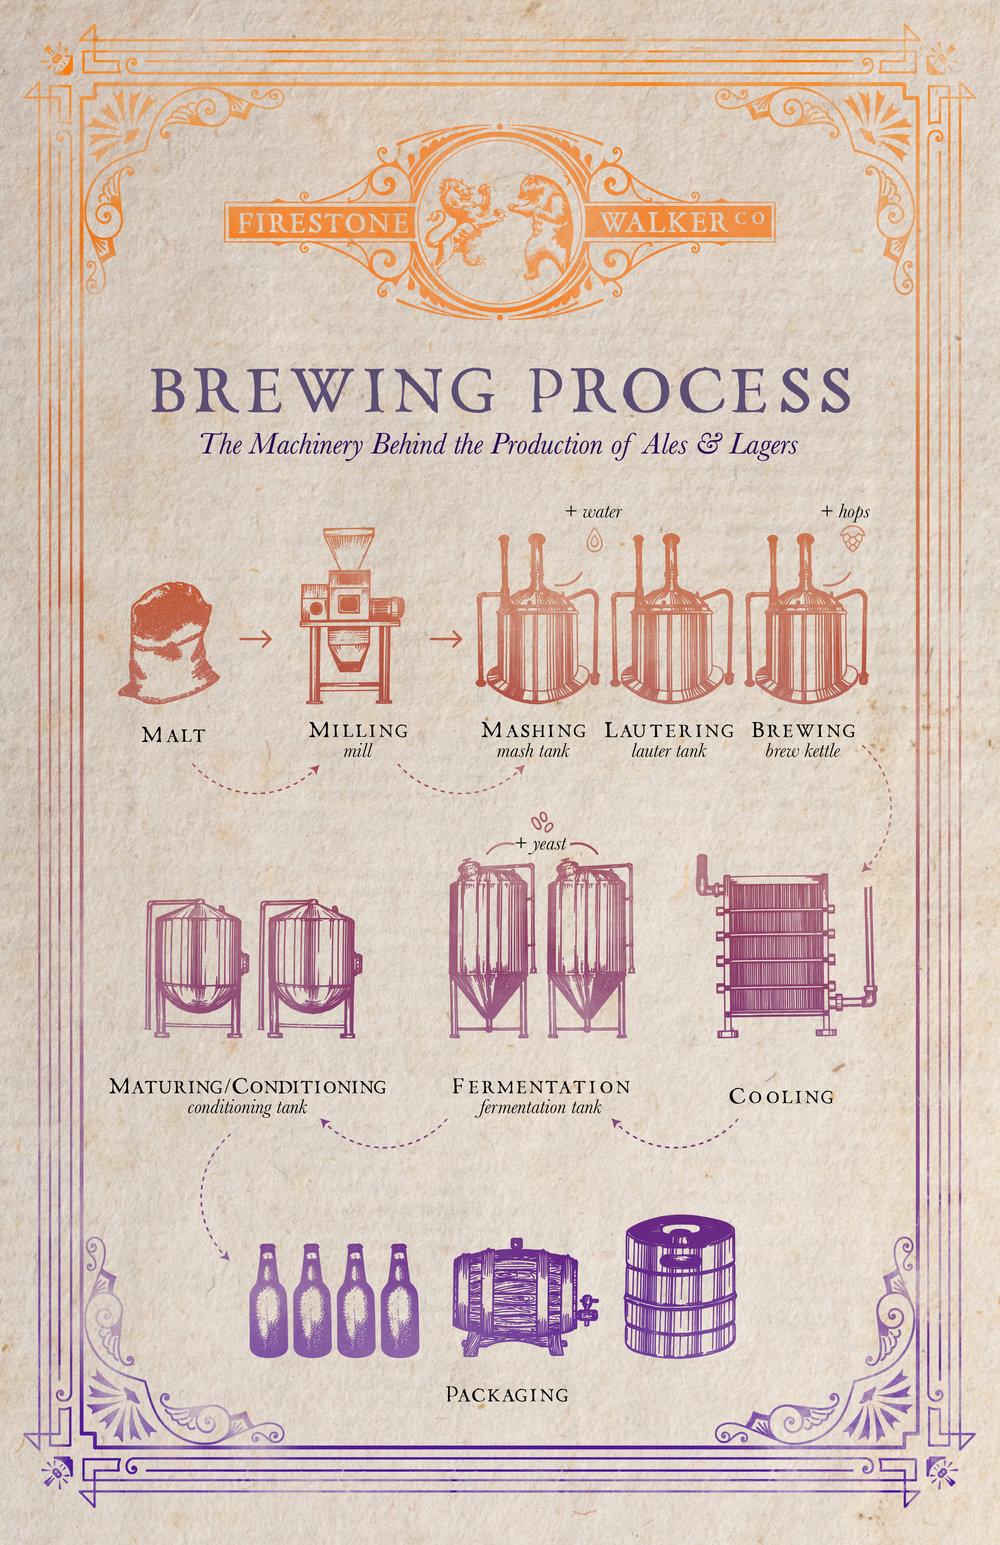 brewingprocess_poster.jpg